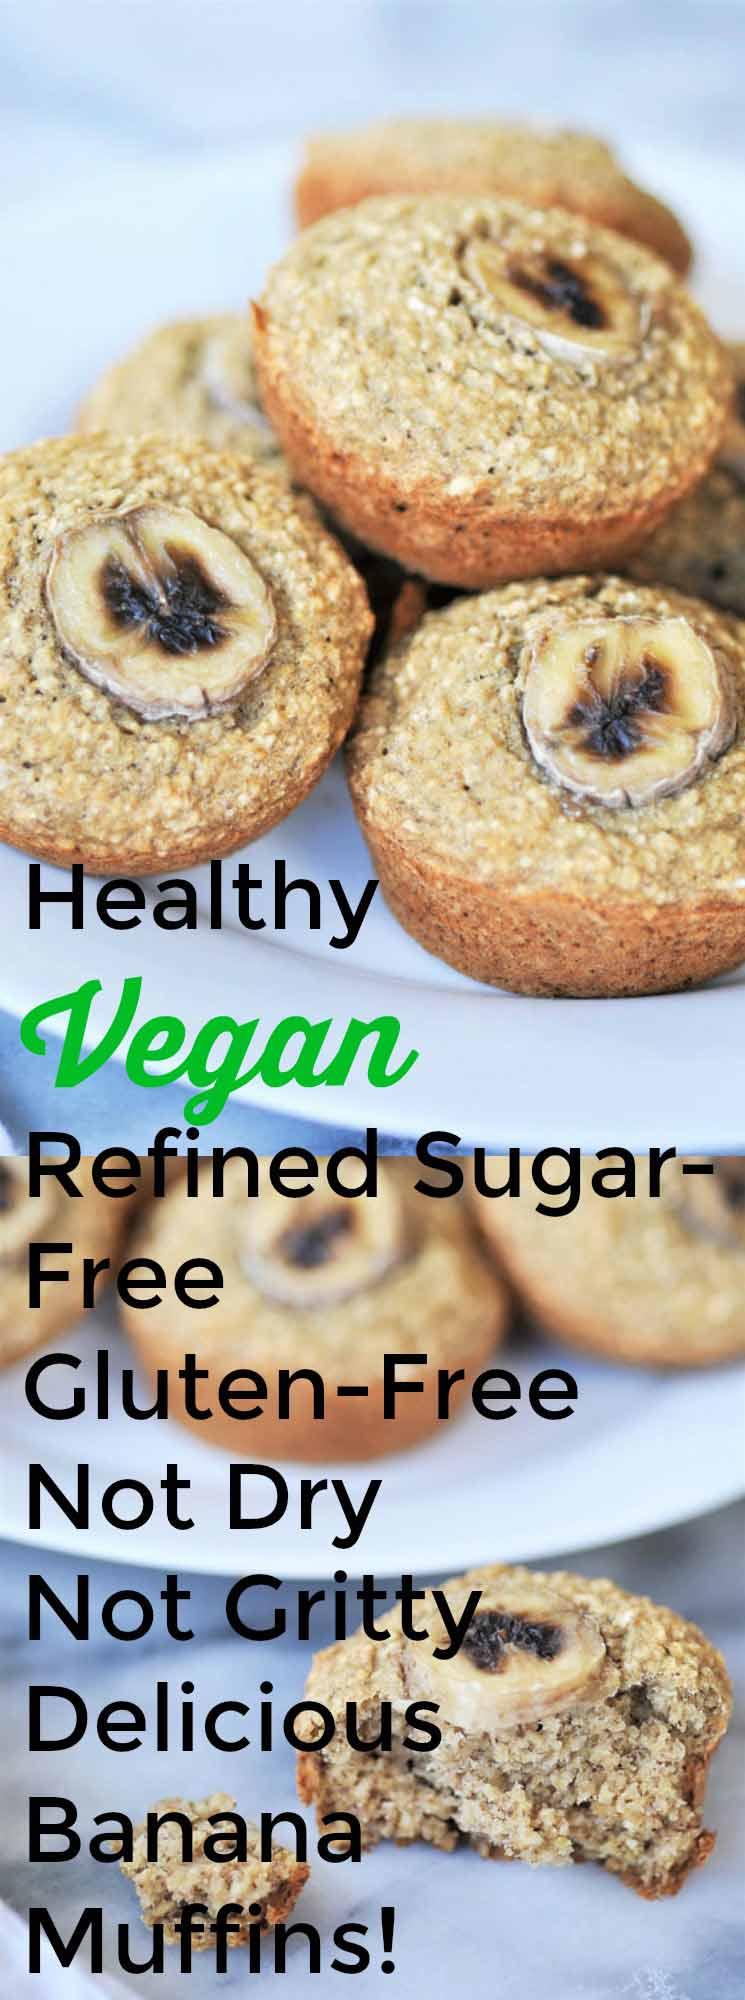 Healthy vegan & gluten-free banana muffins collage for Pinterest.